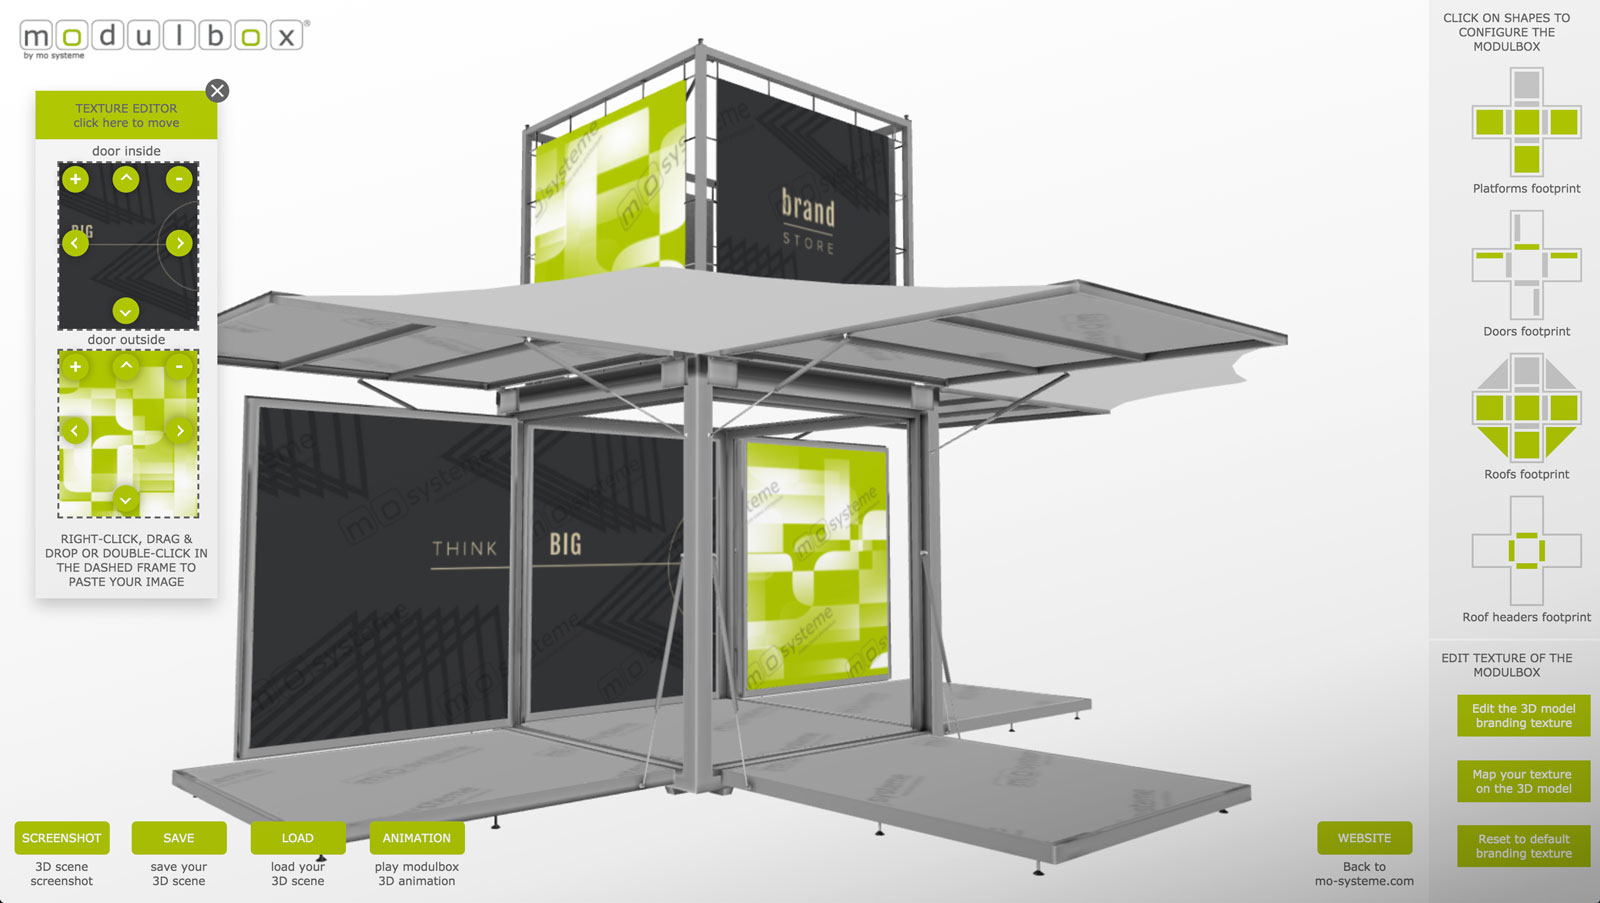 modulbox 3D Arena - do it yourself